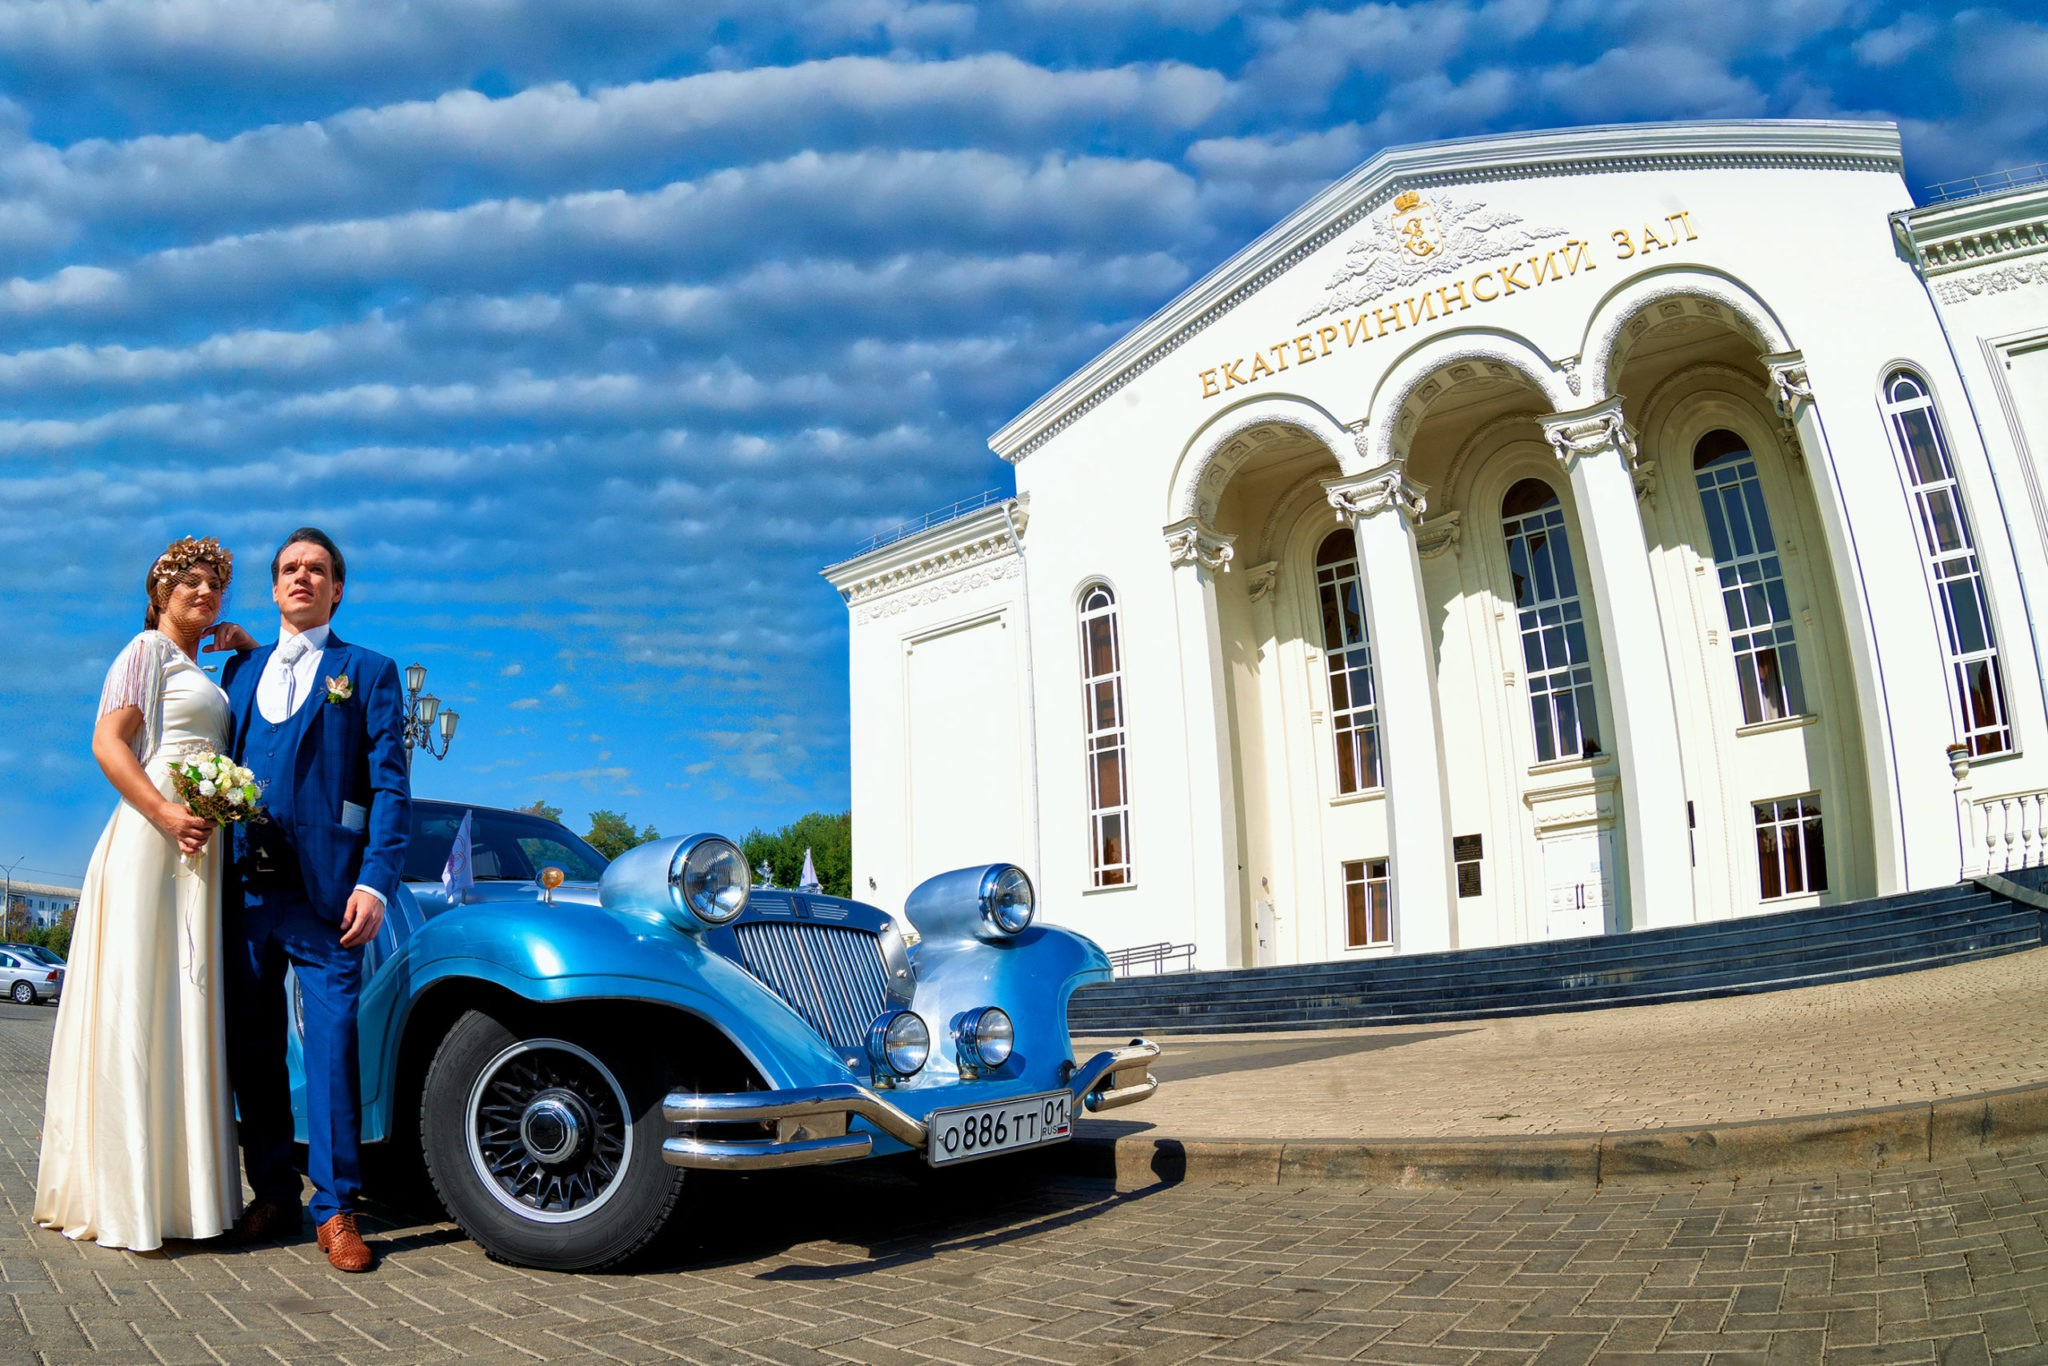 Екатриниский зал, съемка перед ЗАГСом. Свадебная съемка на fish eye от Краснодарского свадебного фотографа молодые с ретро авто